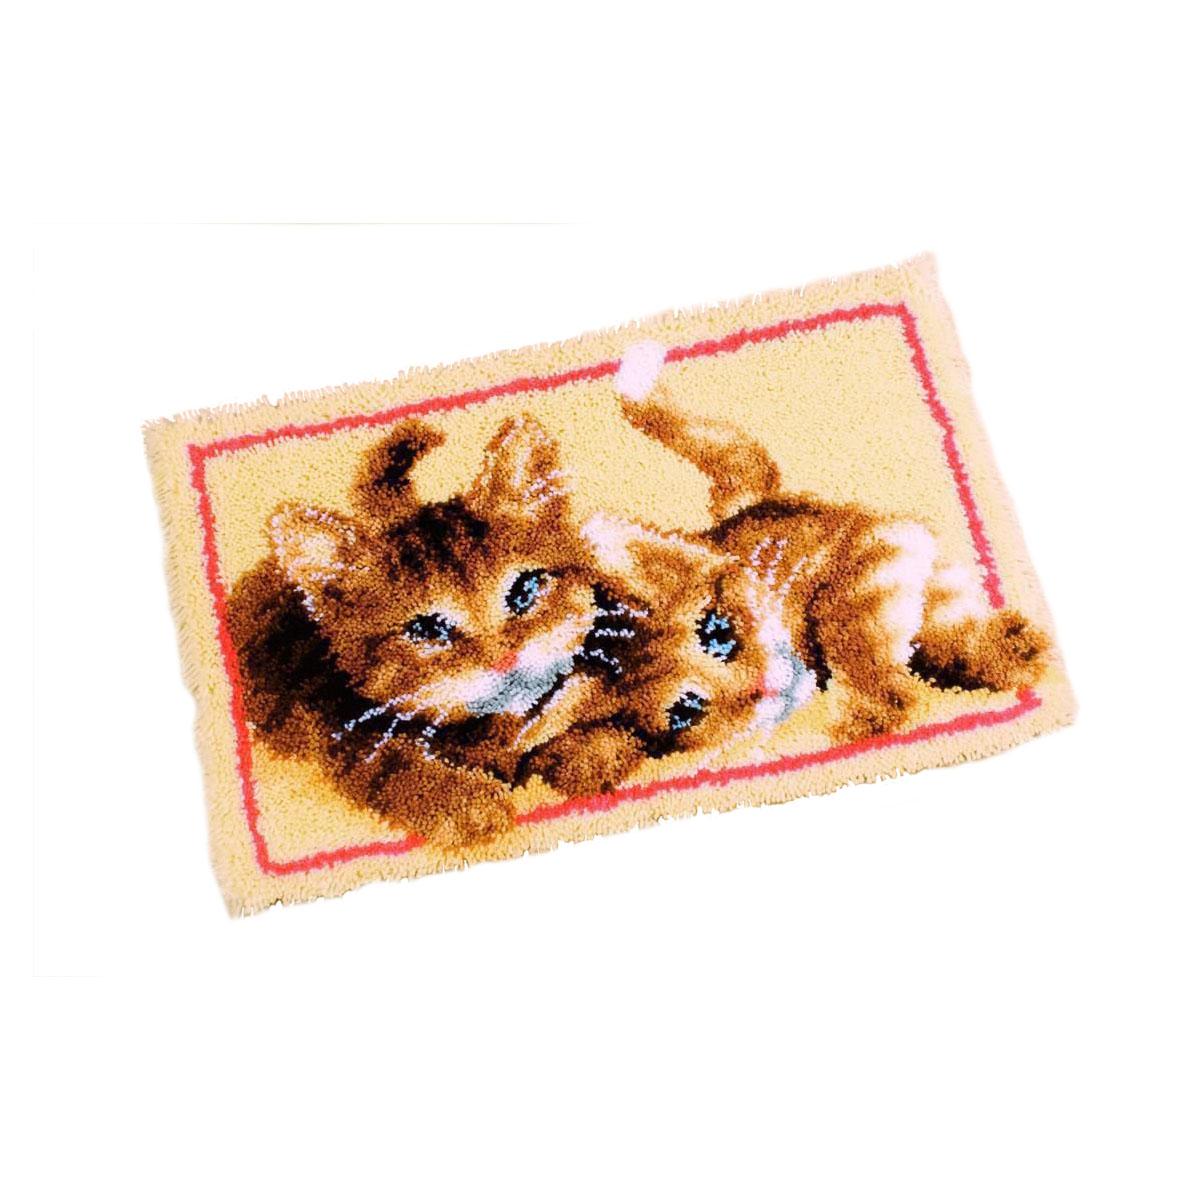 0145610-PN Коврик (ковровая техника) Vervaco 'Играющие котята' 70x45 см